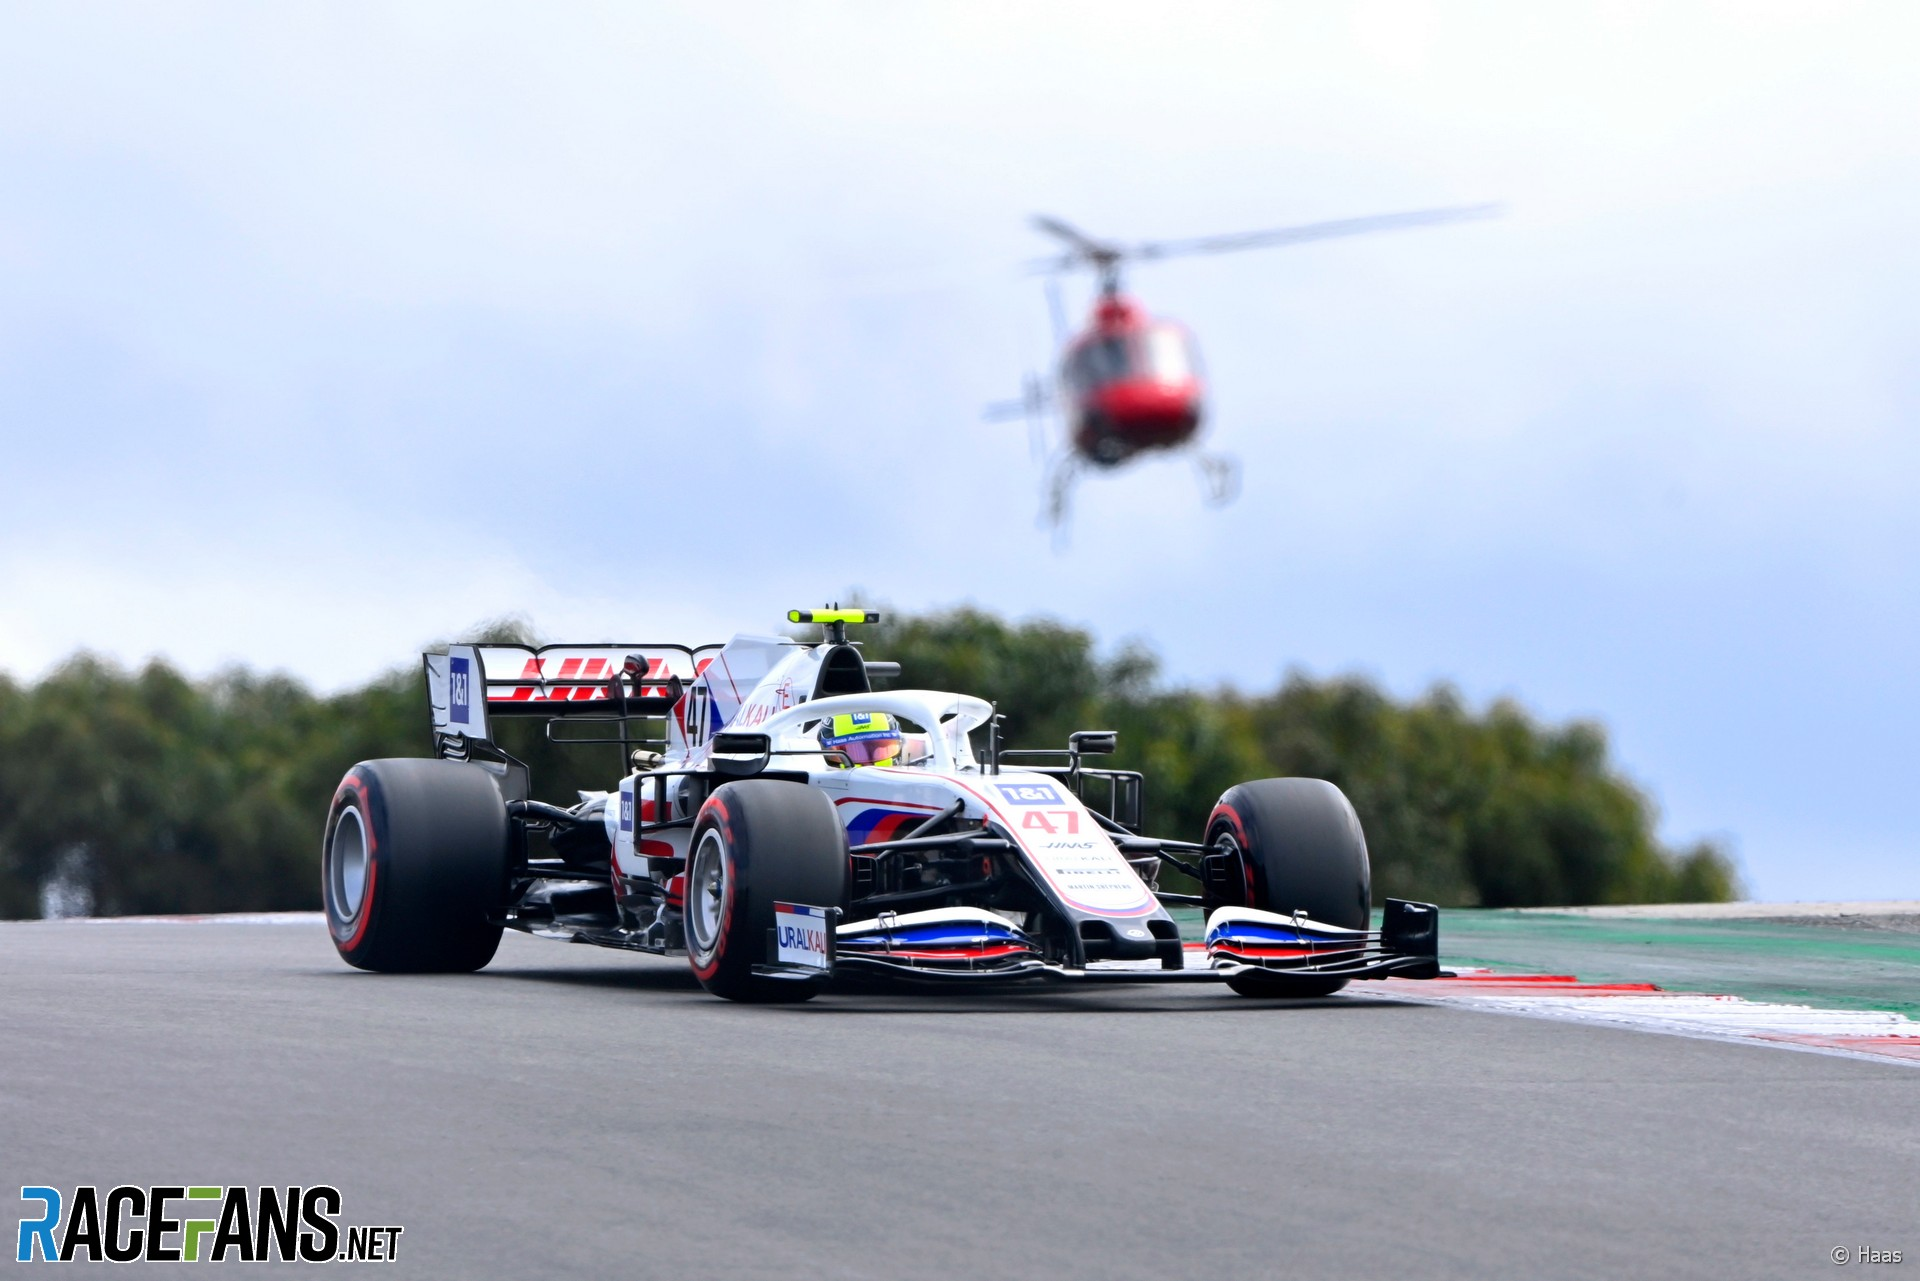 Mick Schumacher, Haas, Autodromo do Algarve, 2021